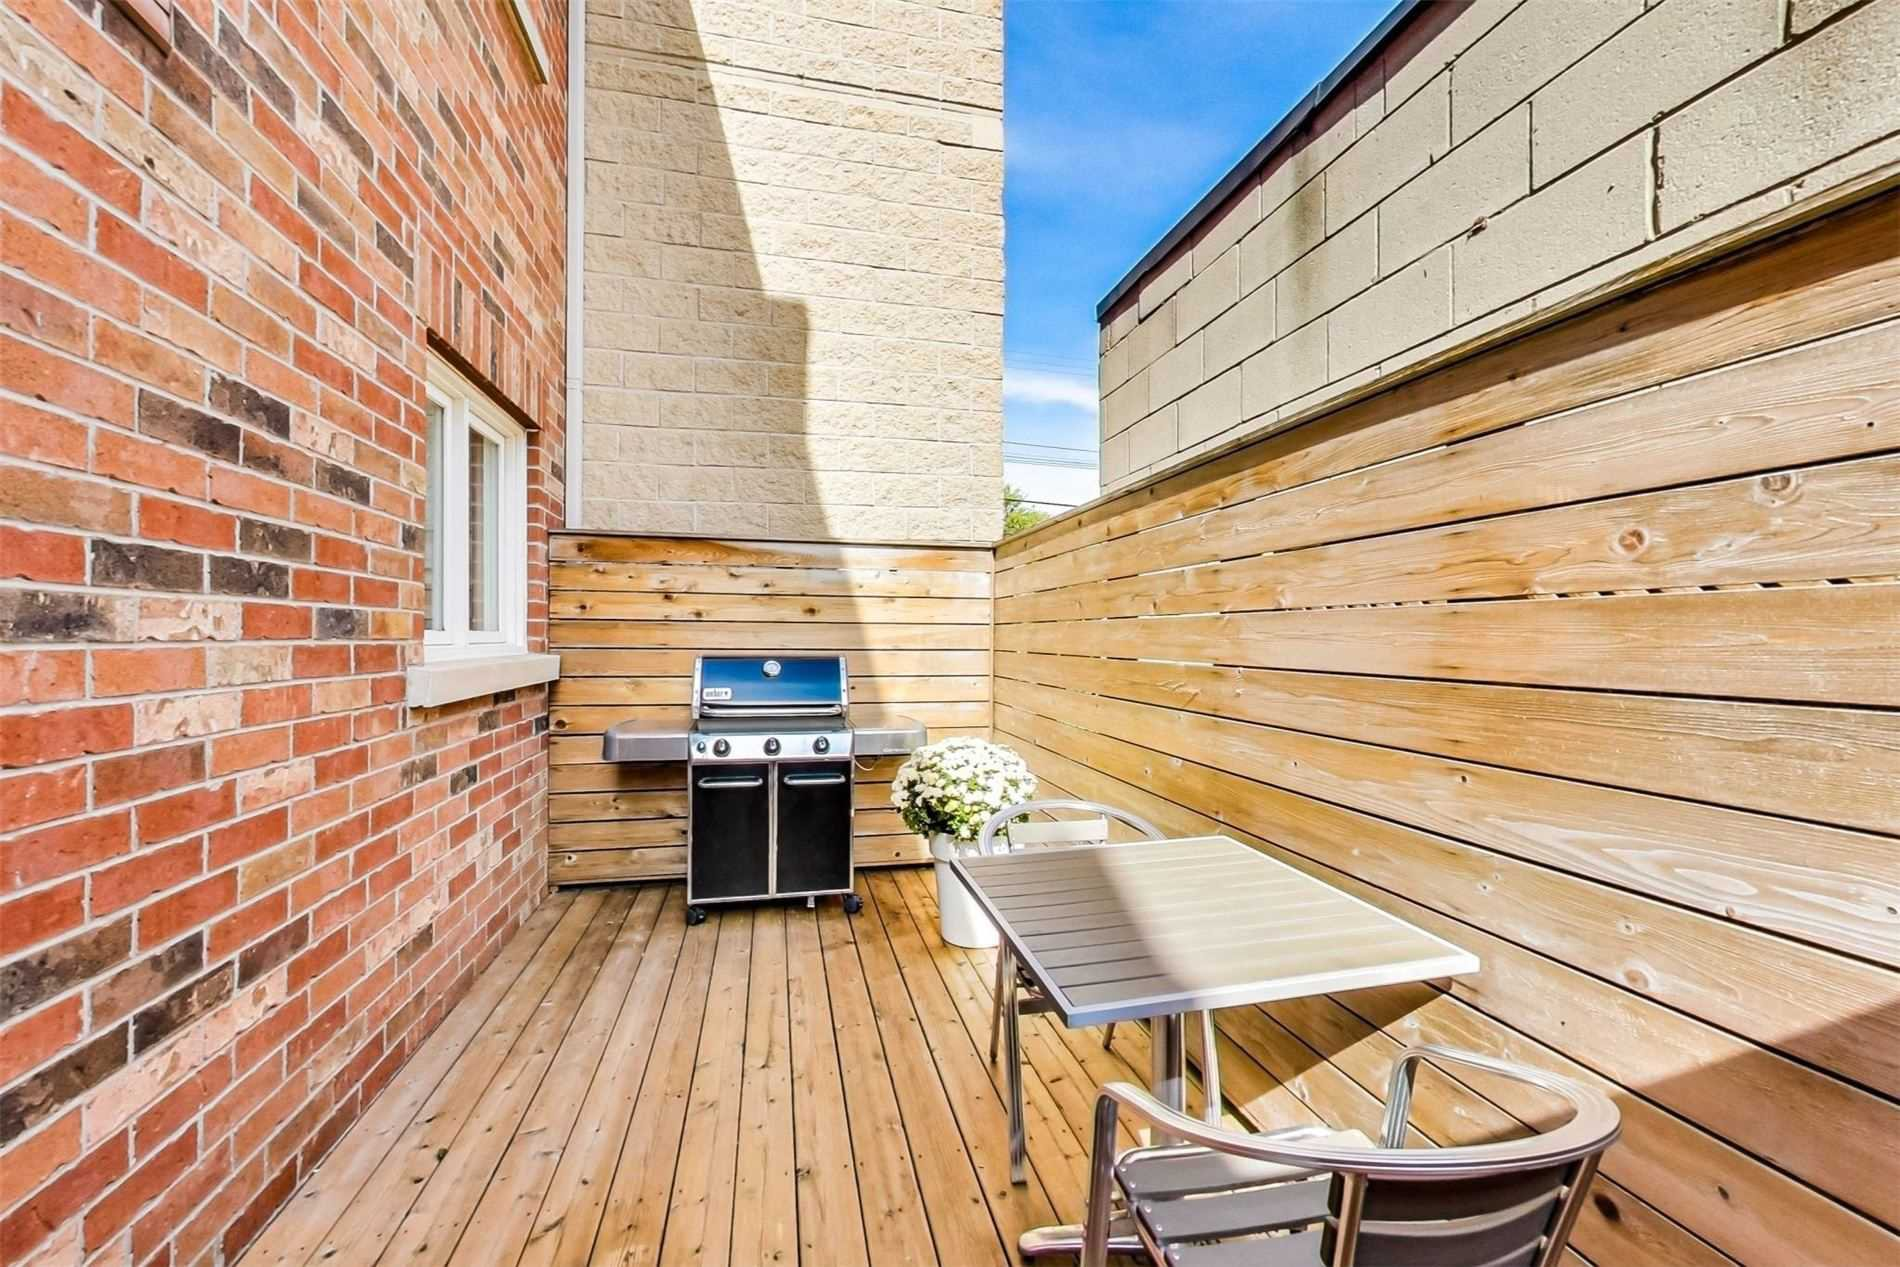 Photo 13: Photos: 213 Heward Avenue in Toronto: South Riverdale House (3-Storey) for sale (Toronto E01)  : MLS®# E4941877